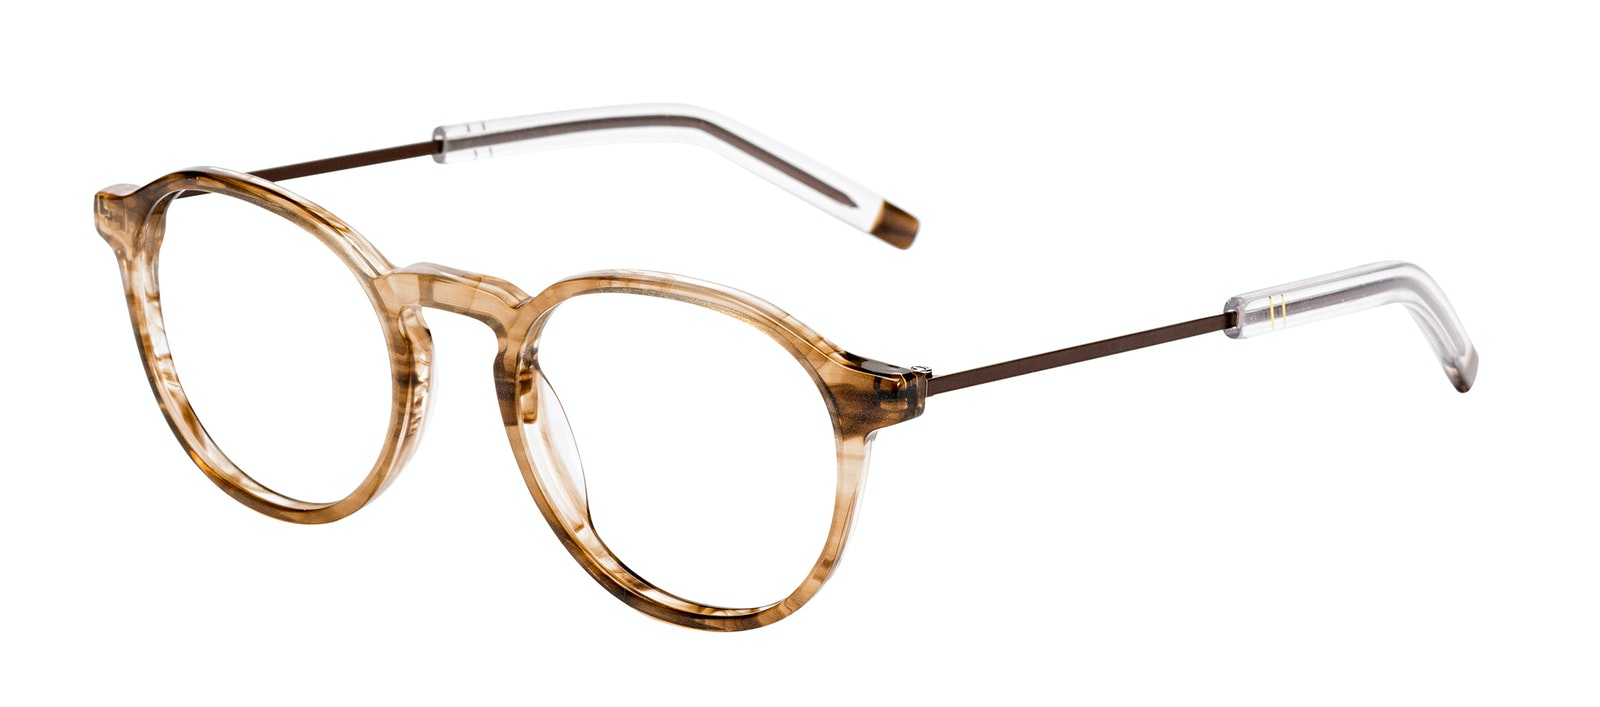 Affordable Fashion Glasses Round Eyeglasses Men Prime Smokey Havana Tilt